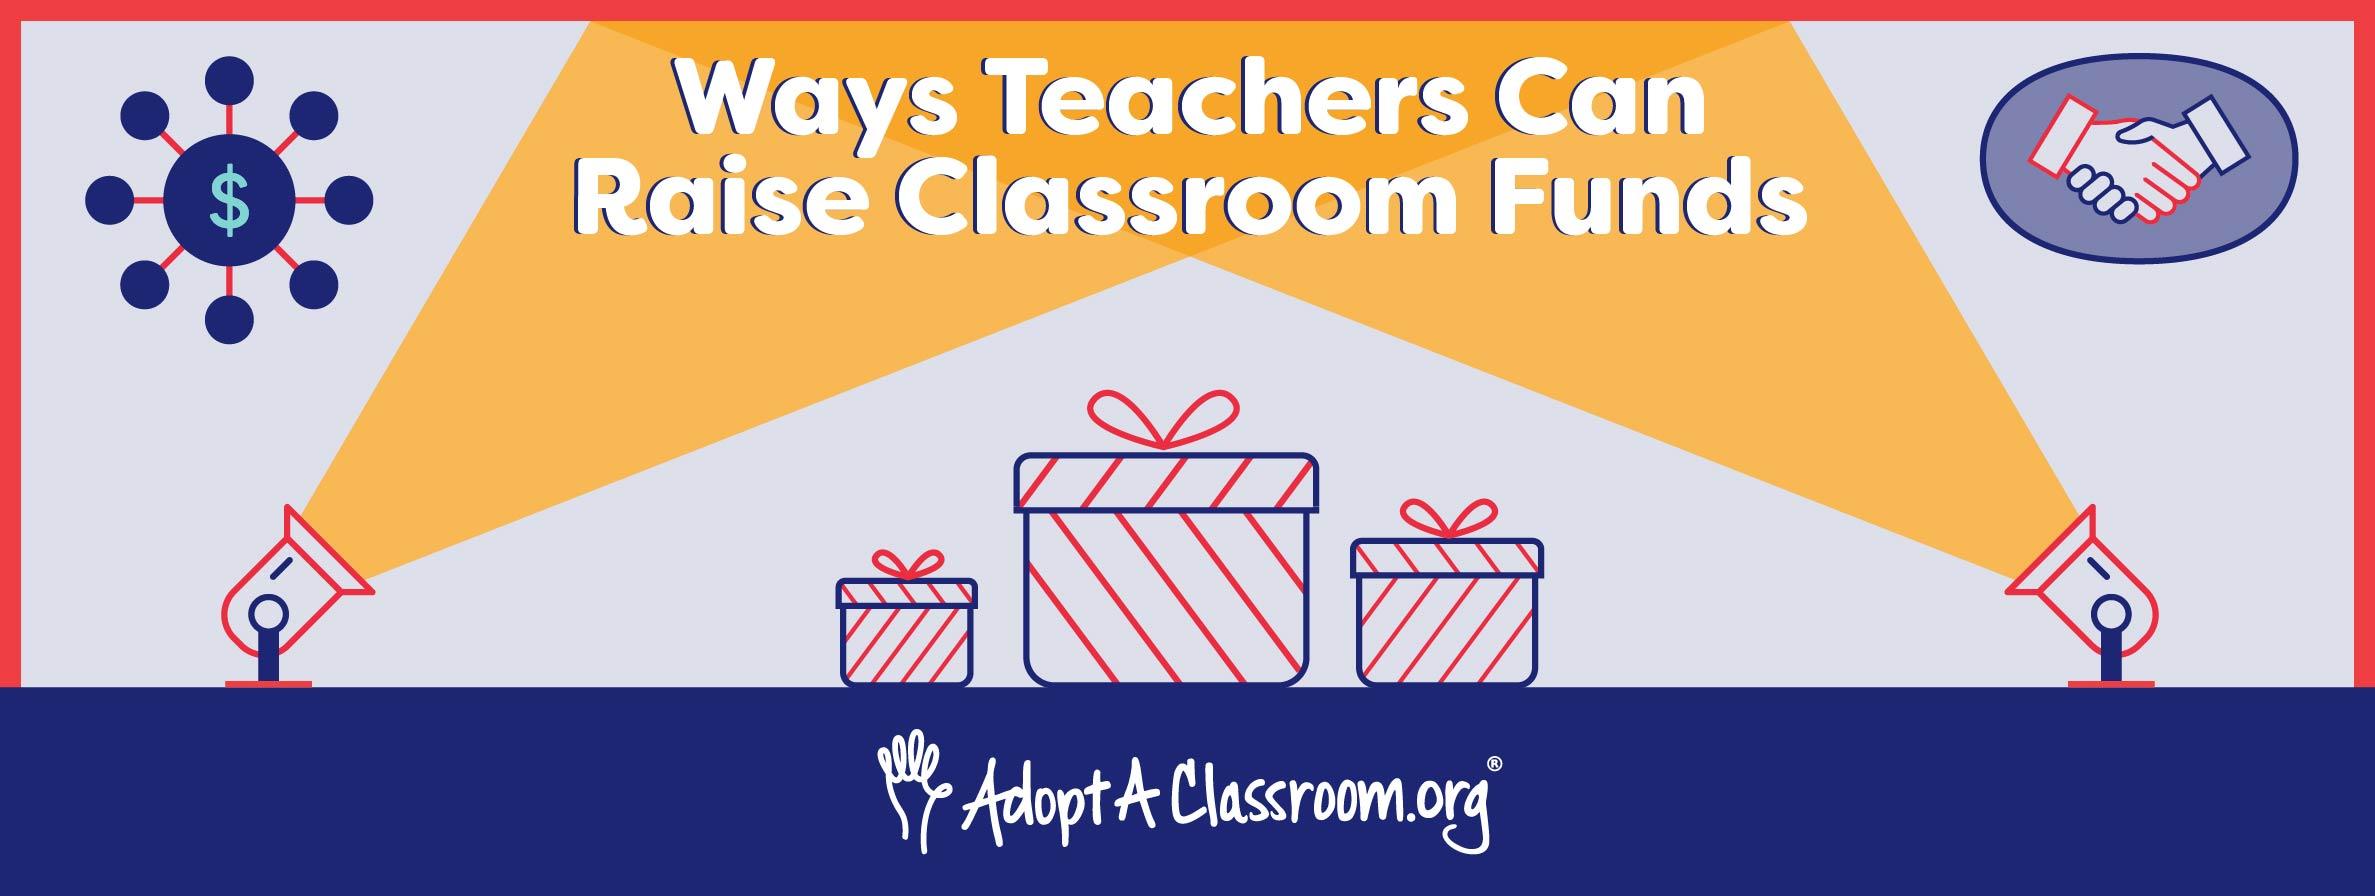 Ways Teachers Can Raise Classroom Funds